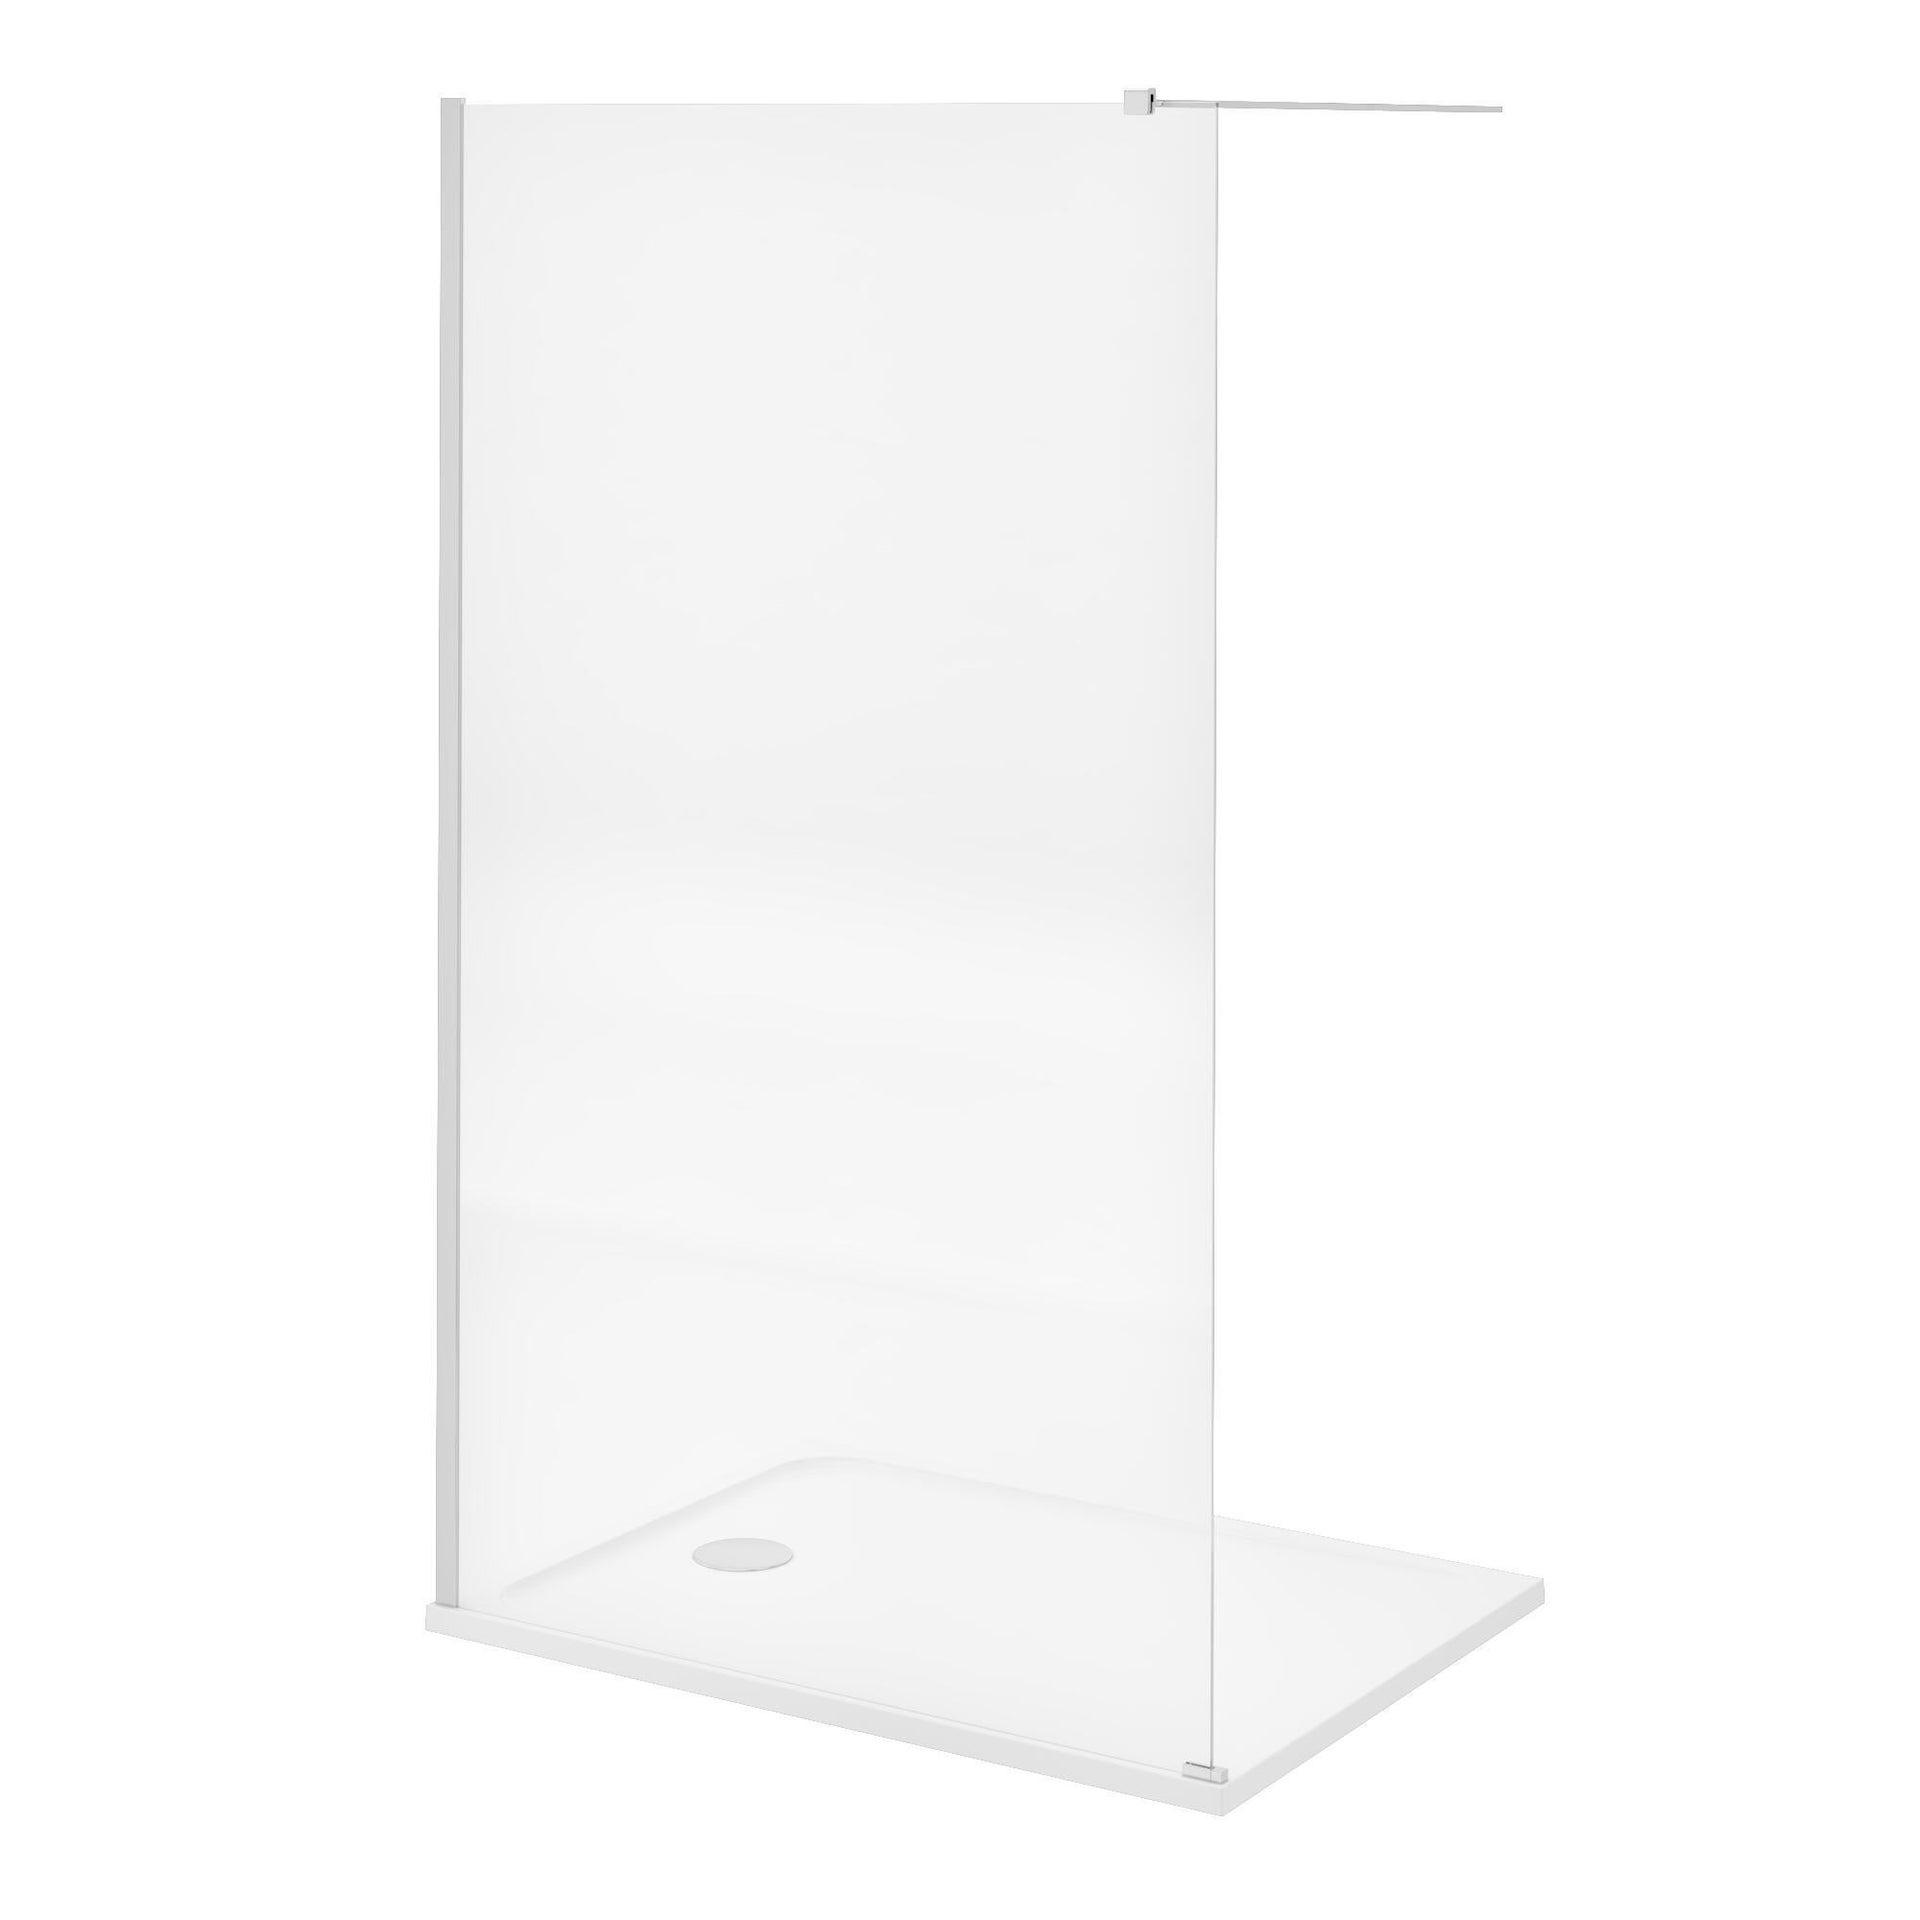 Doccia walk in L 120, H 200 cm, vetro 8 mm trasparente cromato - 10